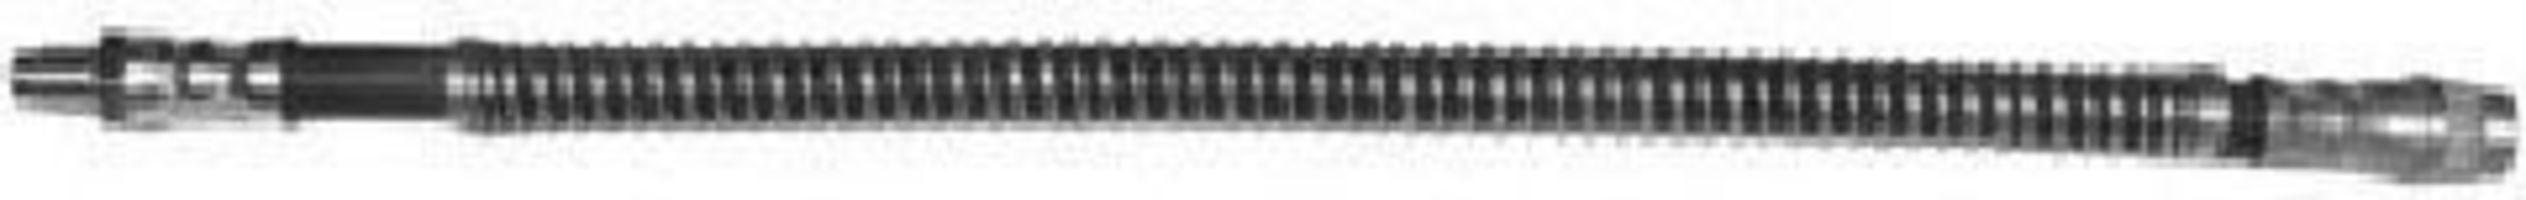 Шланг тормозной METALCAUCHO 96046